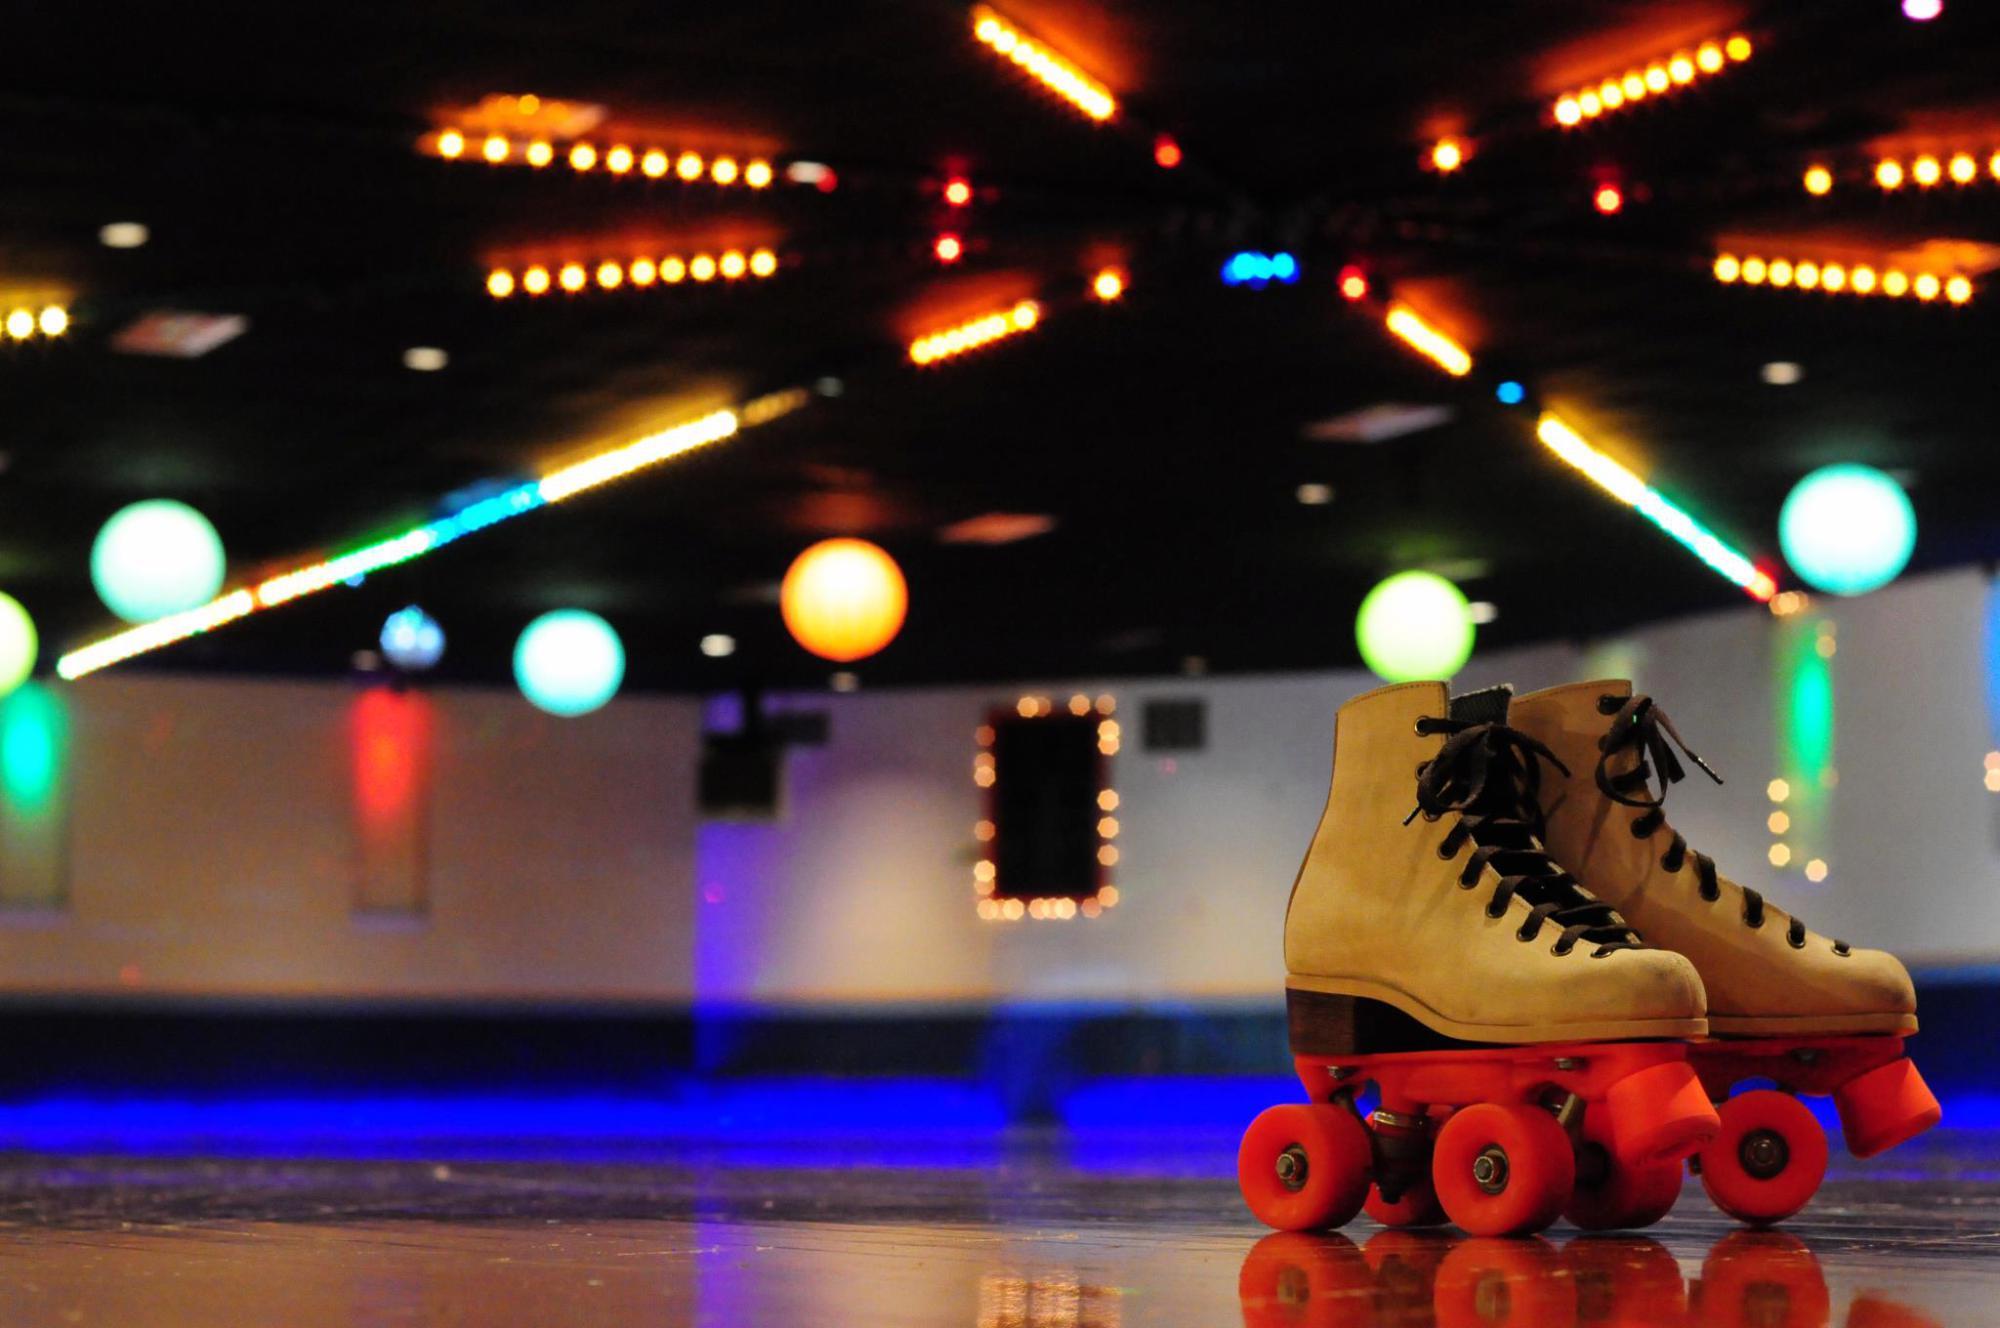 Roller skating rink durham - Youth Skate Night